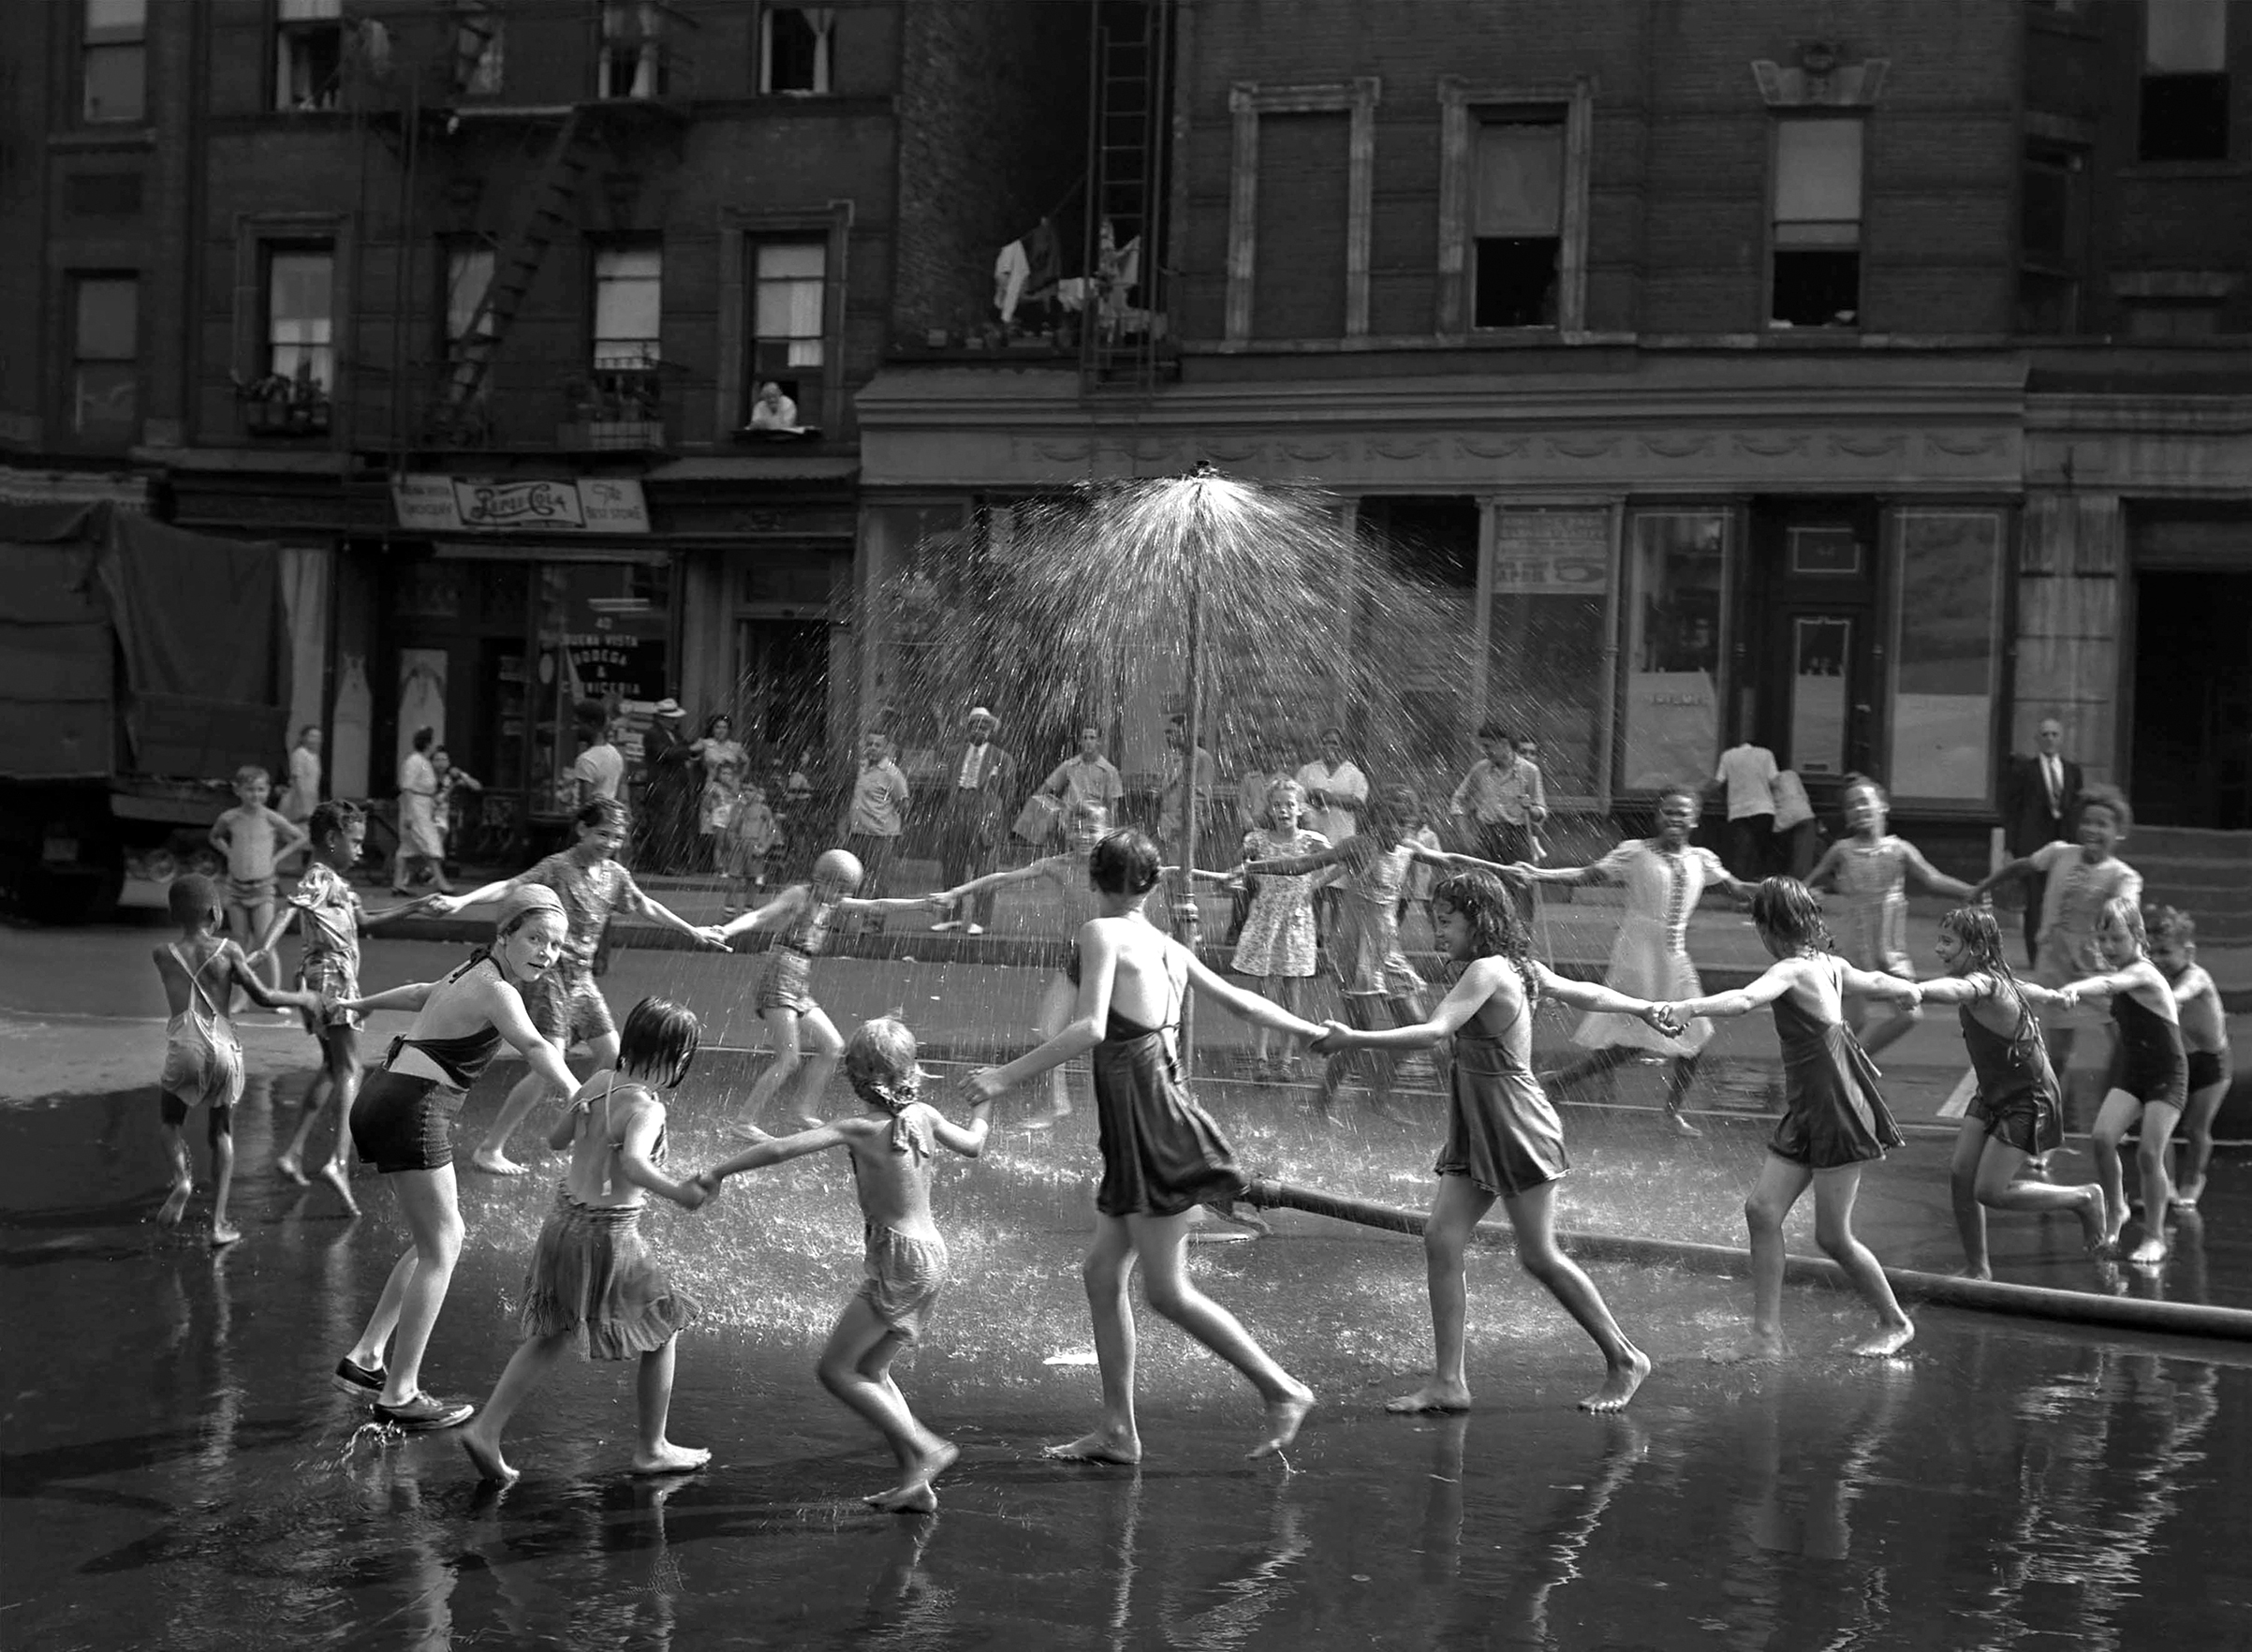 LaSalle at Amsterdam Avenue, 1946.